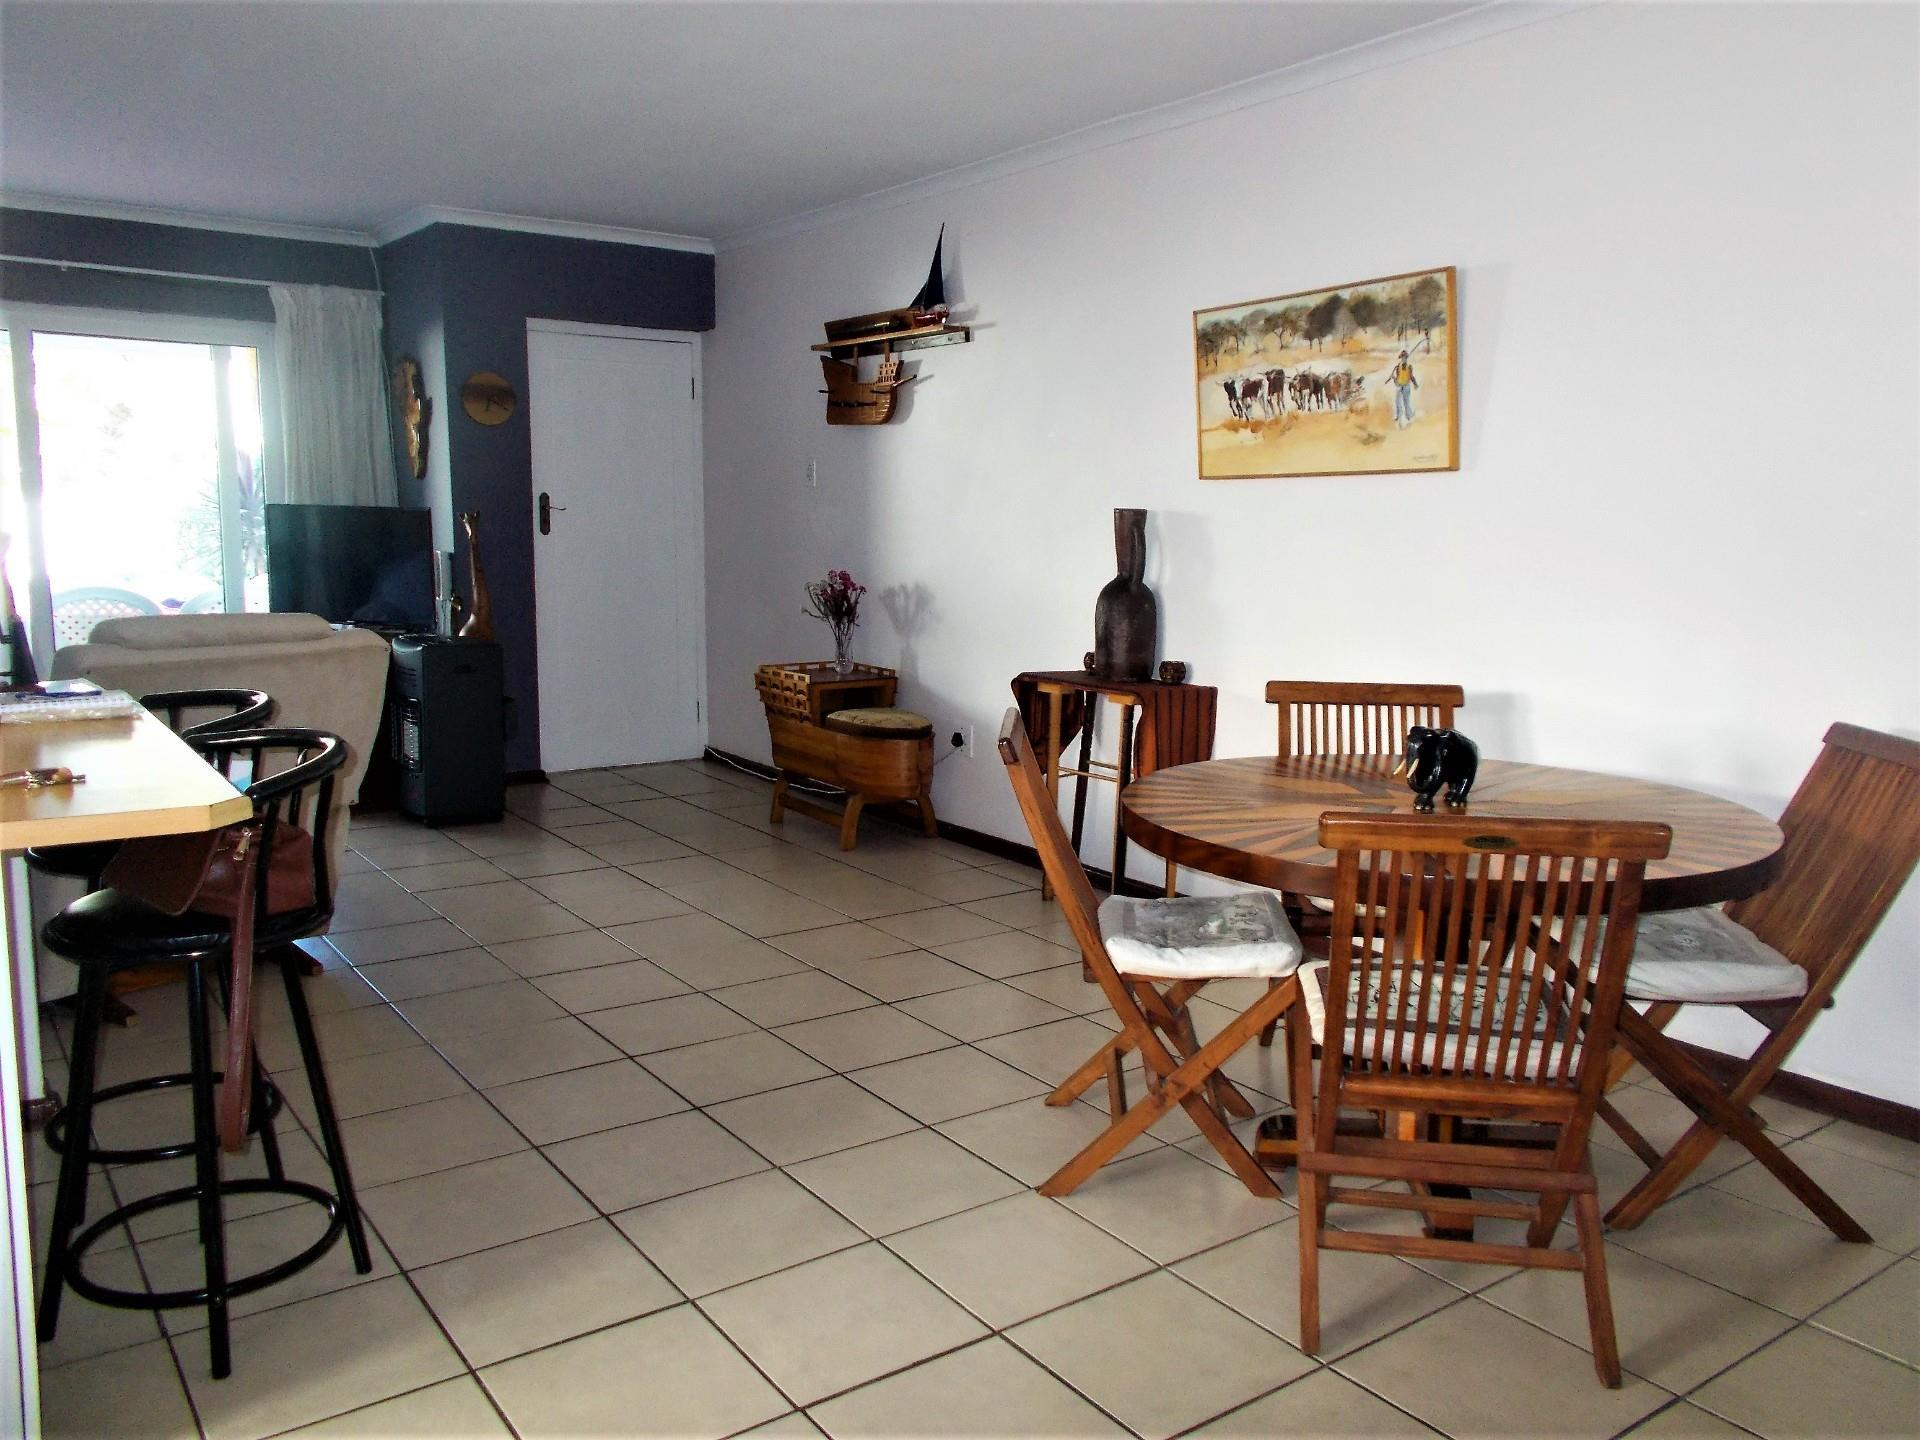 3 Bedroom House For Sale in Marina Da Gama